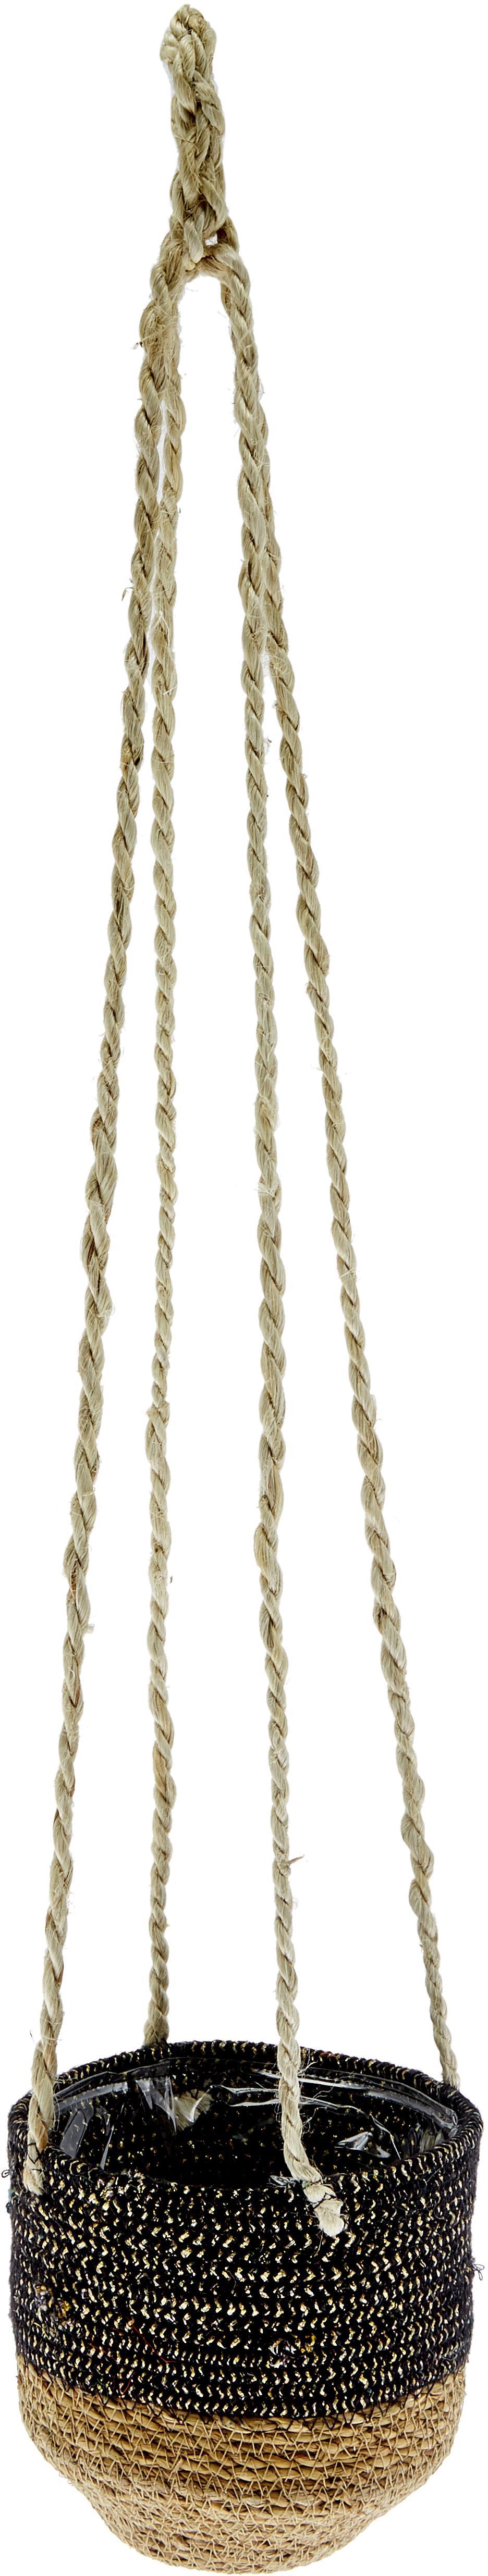 Portavaso pensile Osanippa, Foglie di Hogla, Marrone, nero, Ø 16 x Alt. 80 cm